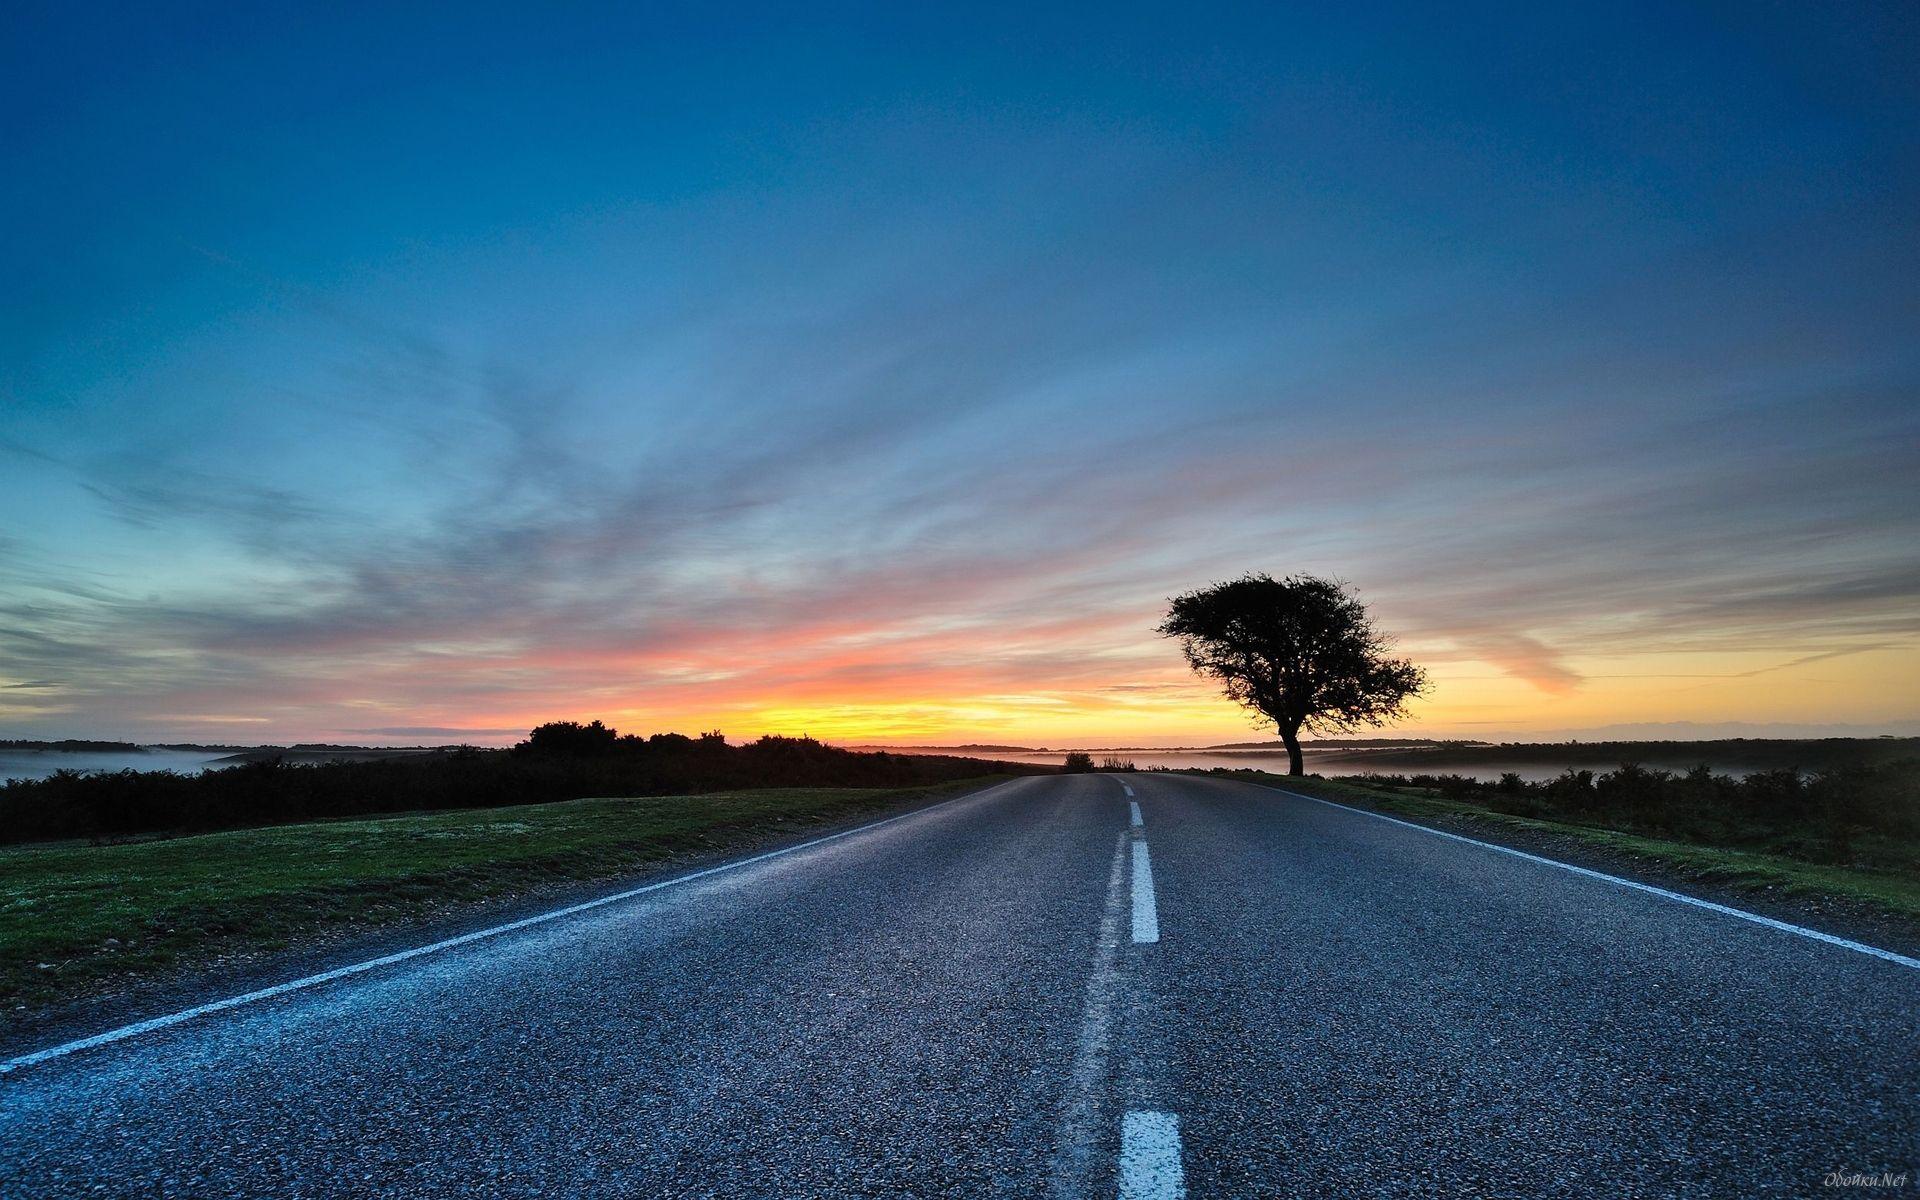 Nancy L Cullen Sunset Road Scenic Wallpaper Sunset Wallpaper Hd wallpaper sunset clouds road hills